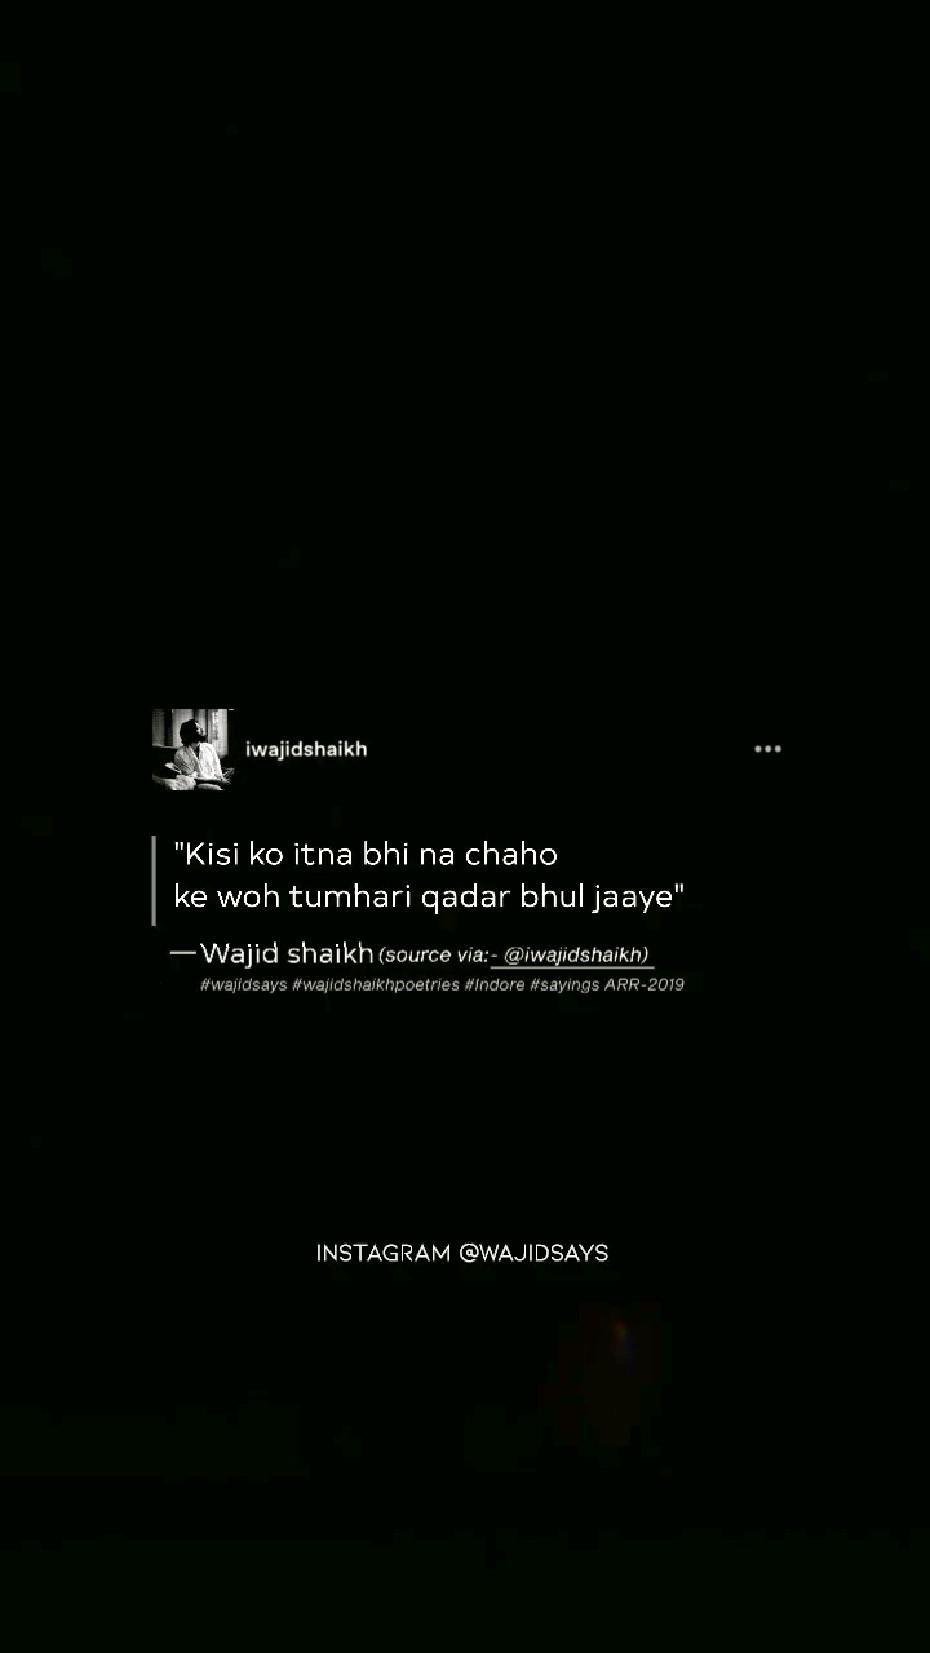 Dil-e-ummid toda hai kisi ne beautiful poetry by wajid shaikh